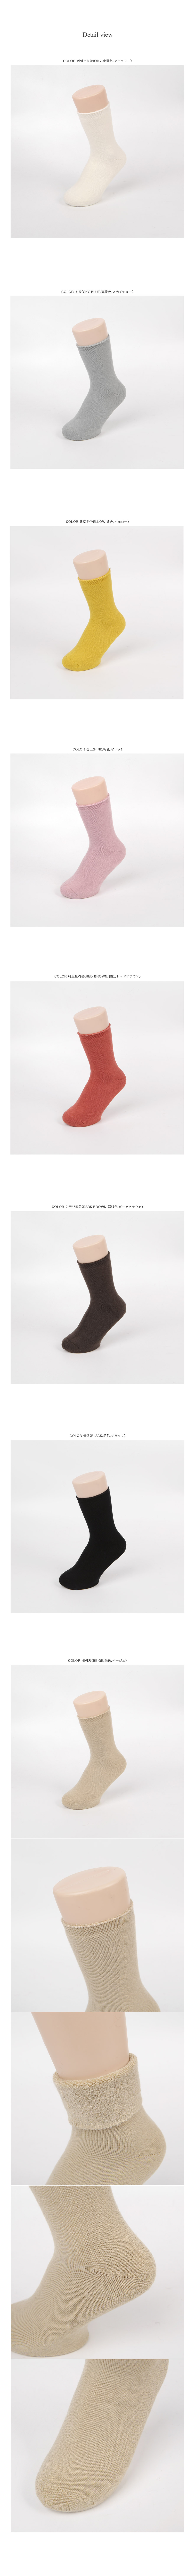 Solid color ridge socks